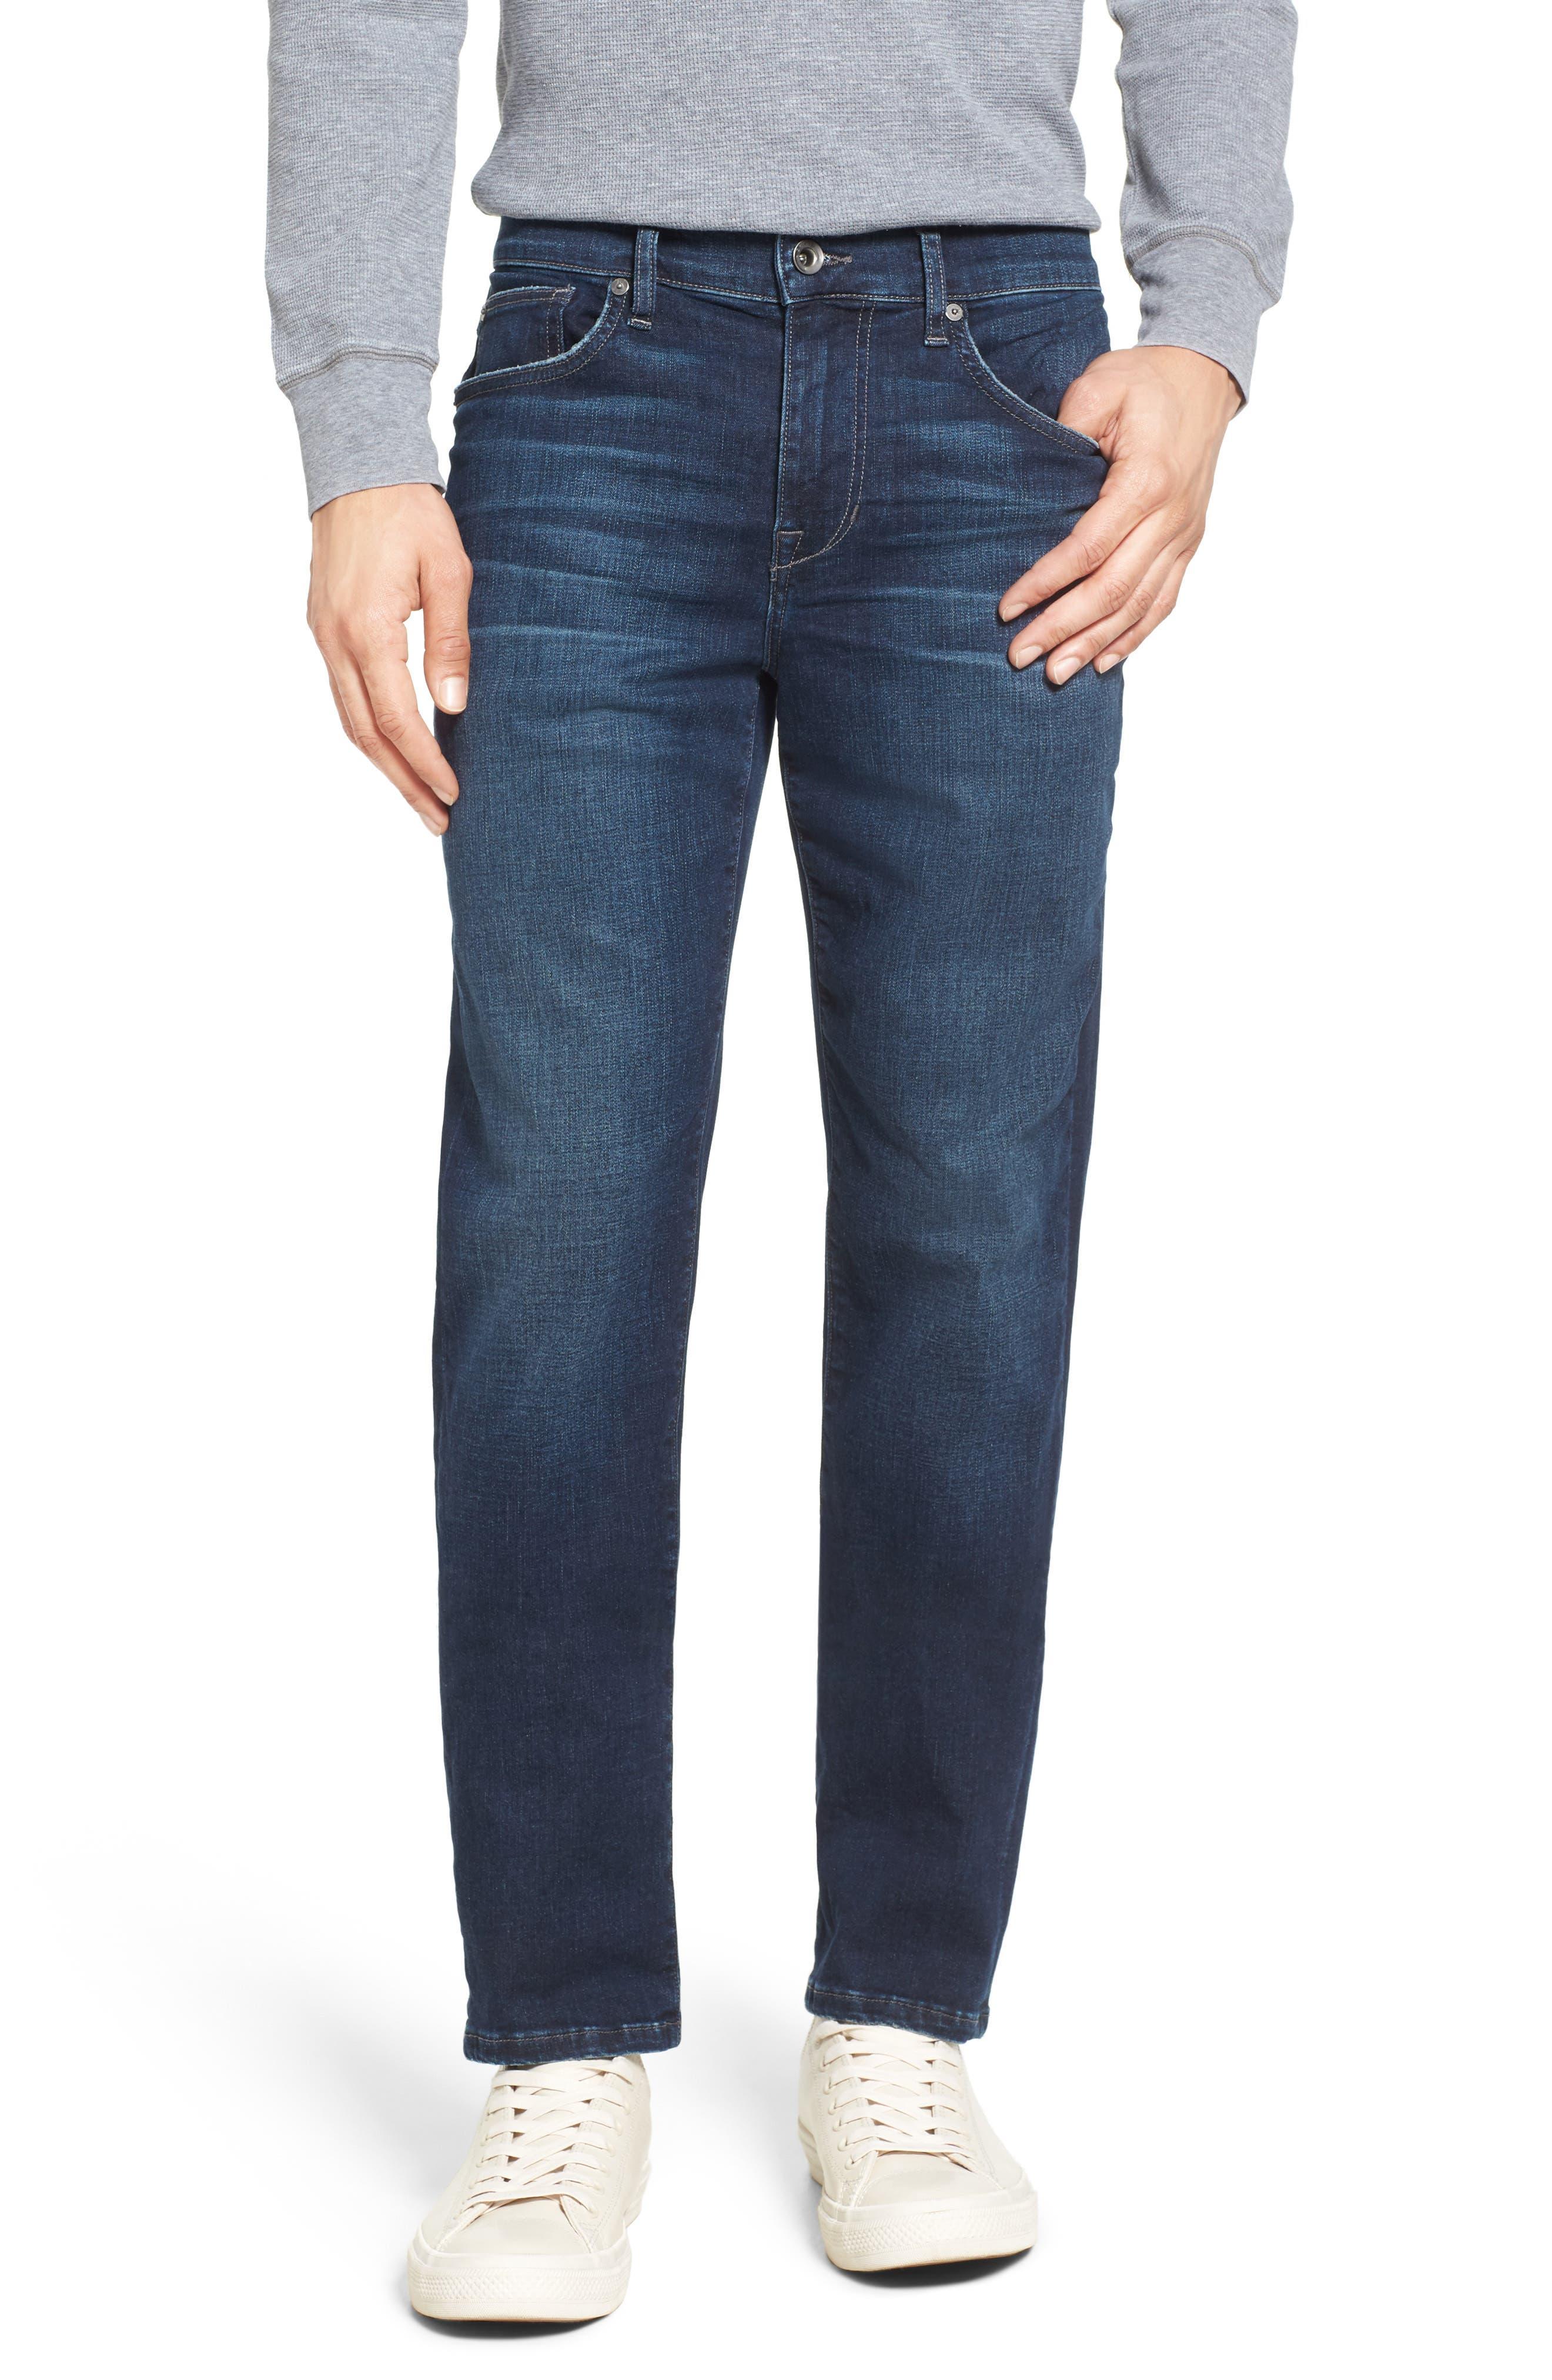 Kinetic Slim Fit Jeans,                         Main,                         color, Aedan